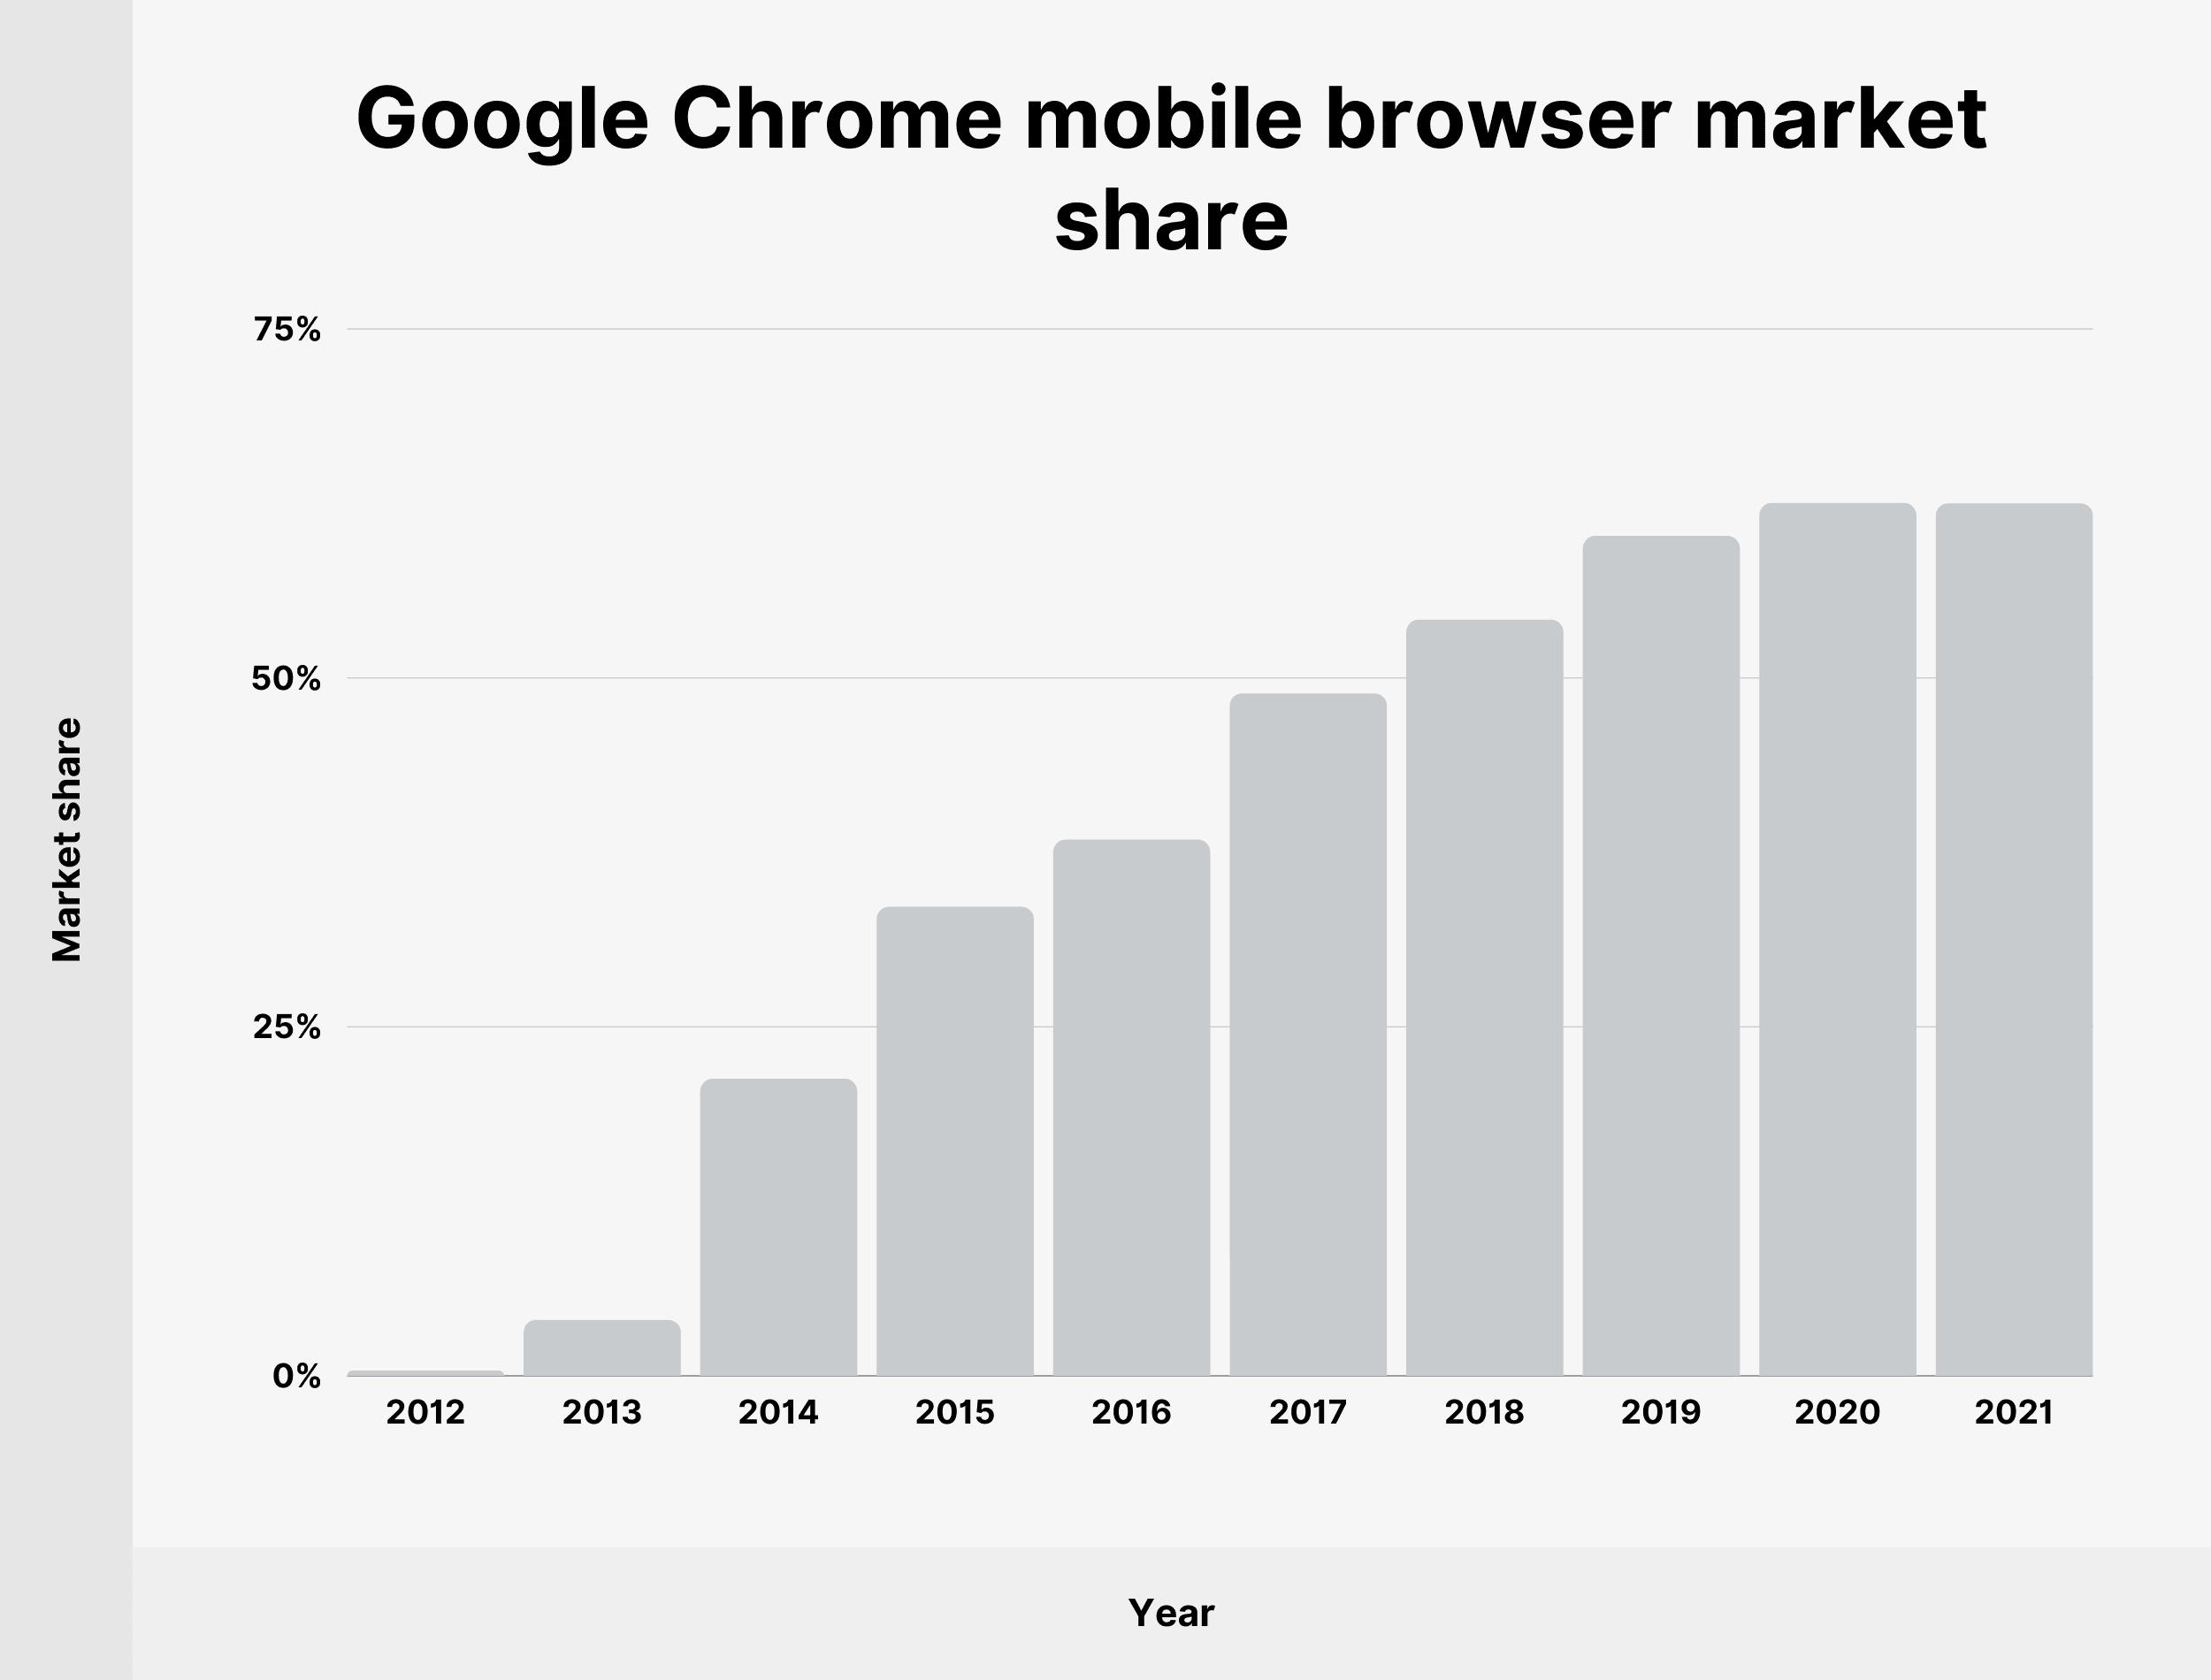 Google Chrome mobile browser market share